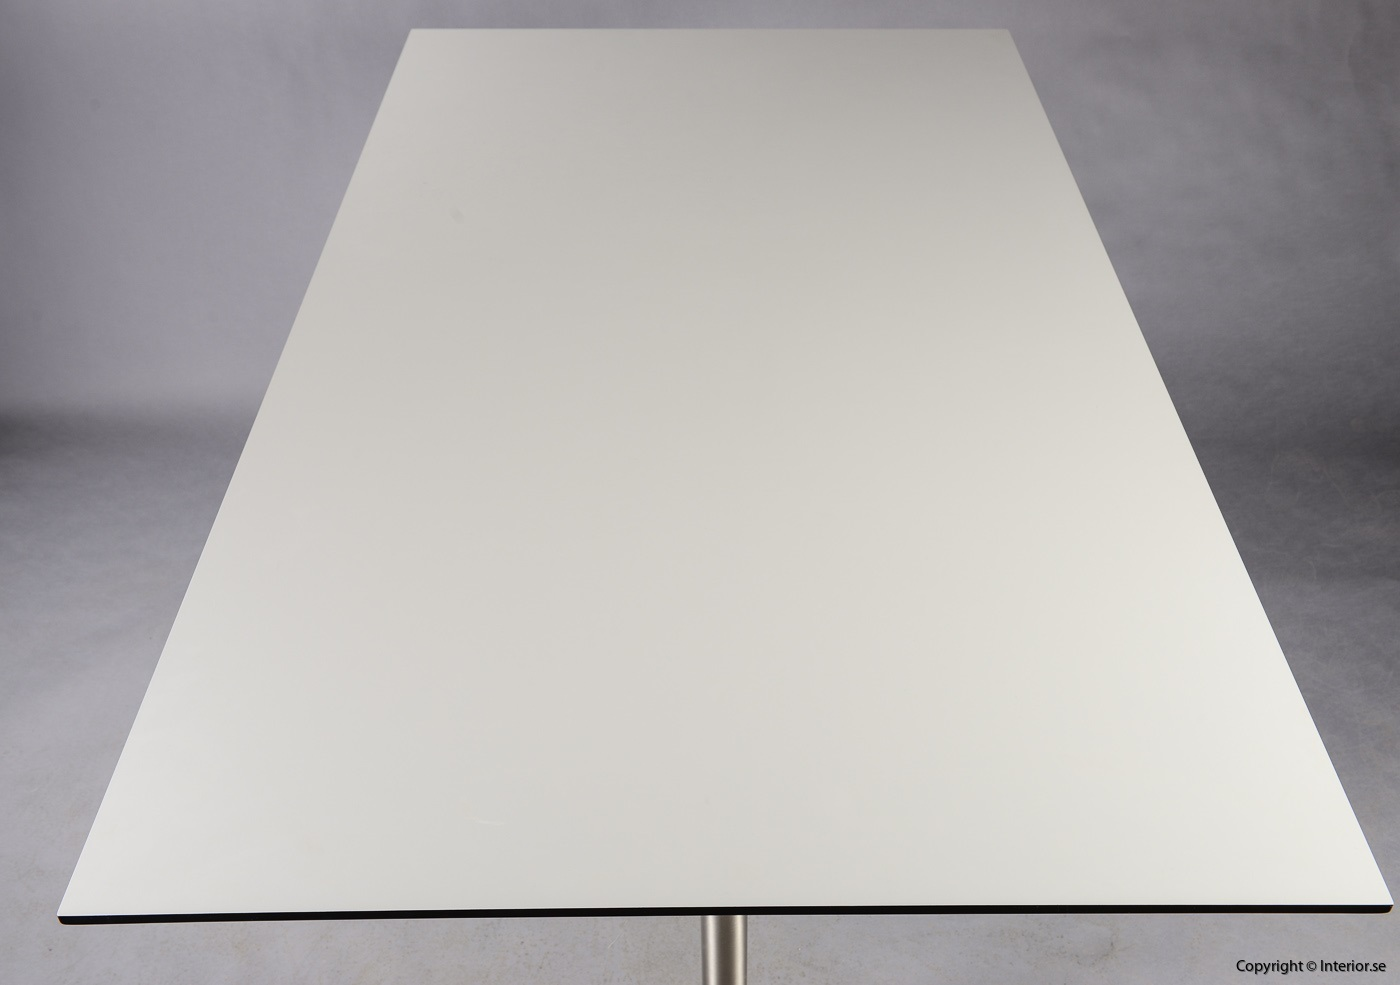 1 Bord Pausitan Spinal Table Paul Leroy begagnade kontorsmöbler designmöbler (6)